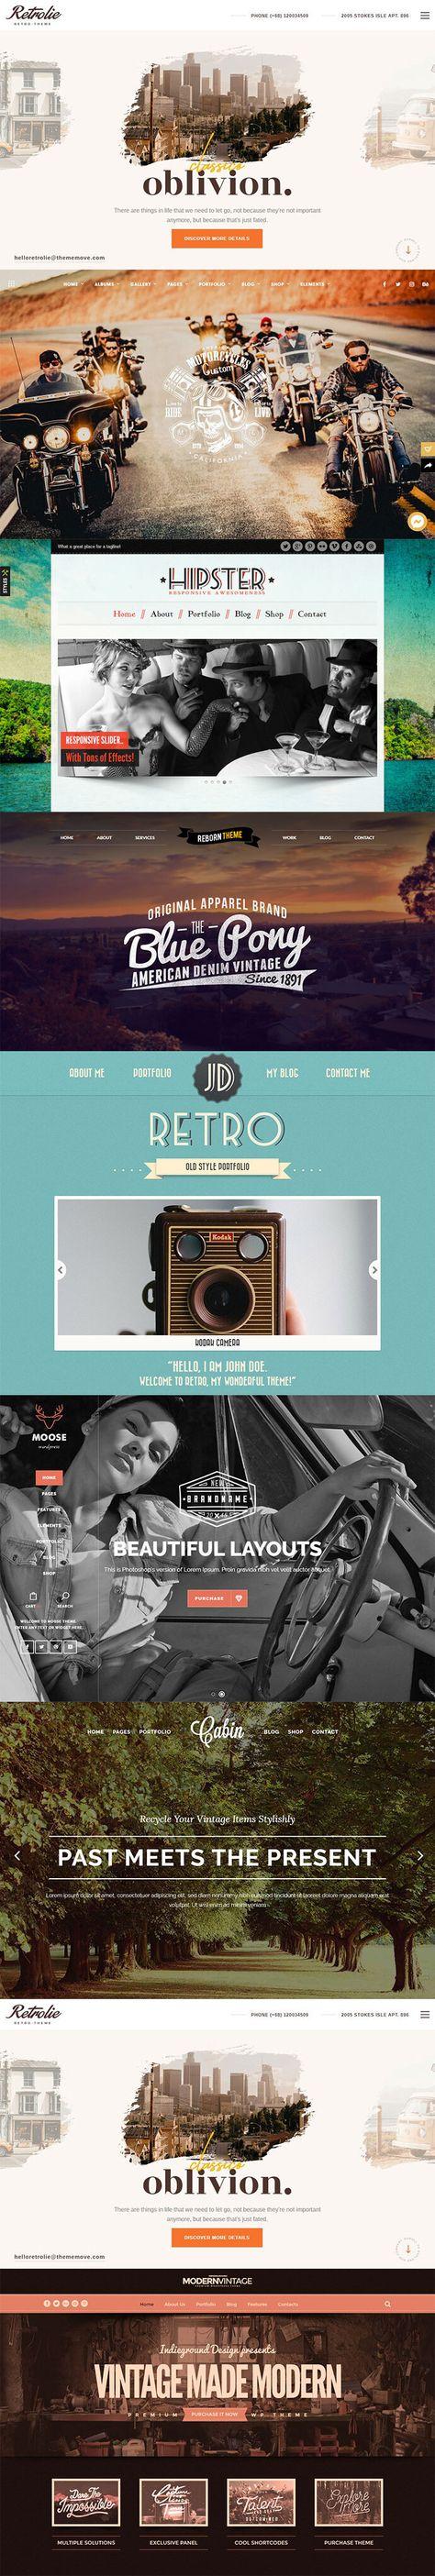 21 WordPress Themes That Totally Define Retro Cool